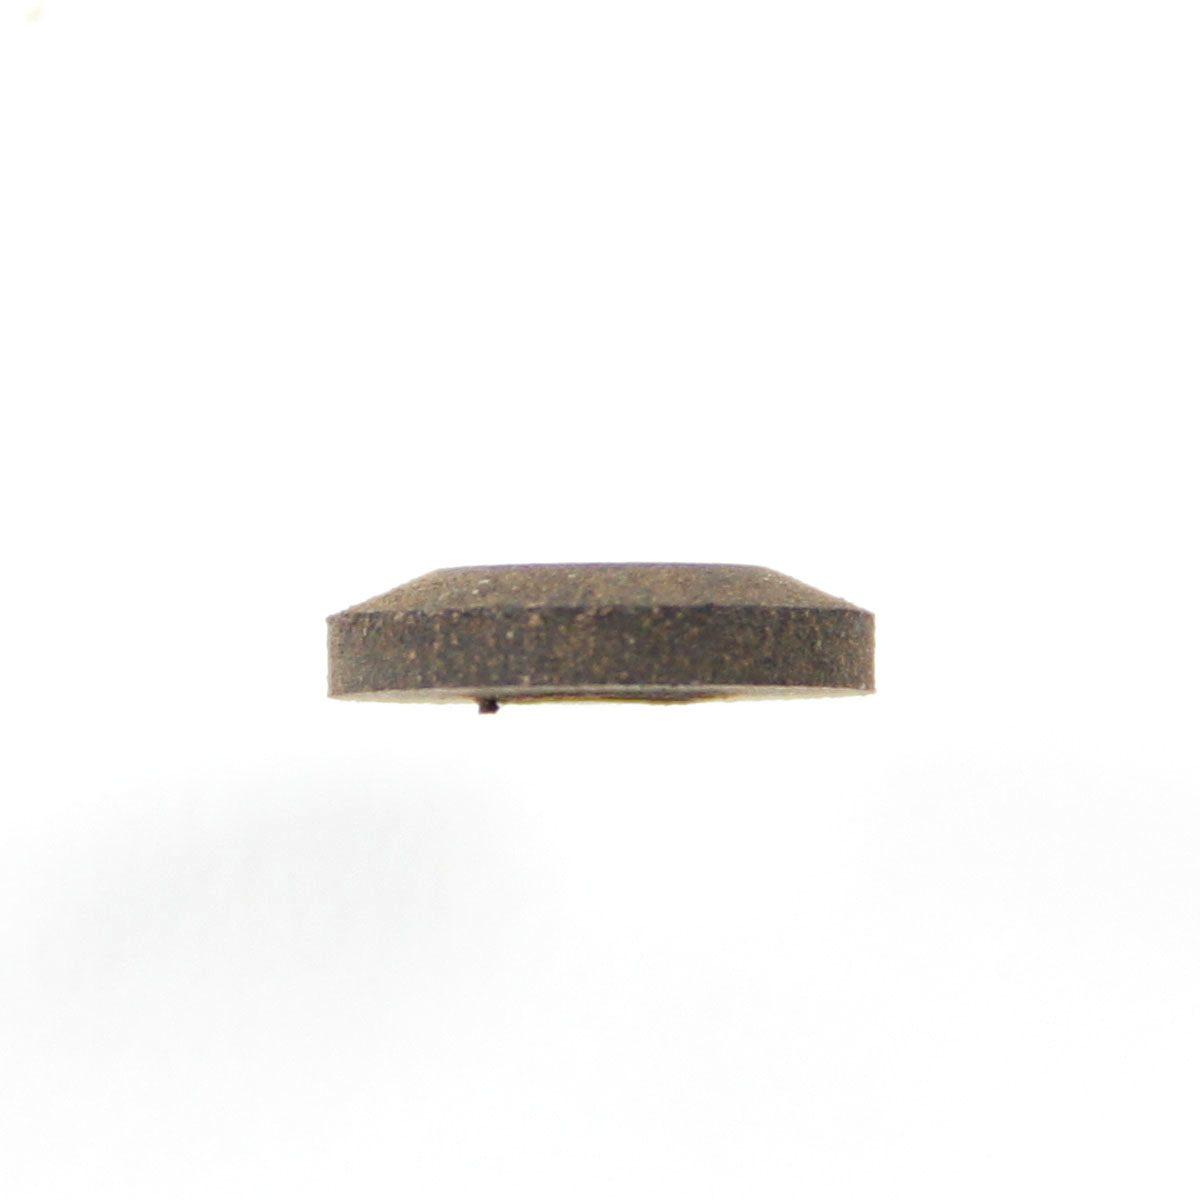 hard rubber clarinet tone hole insert od 436 id 205 3